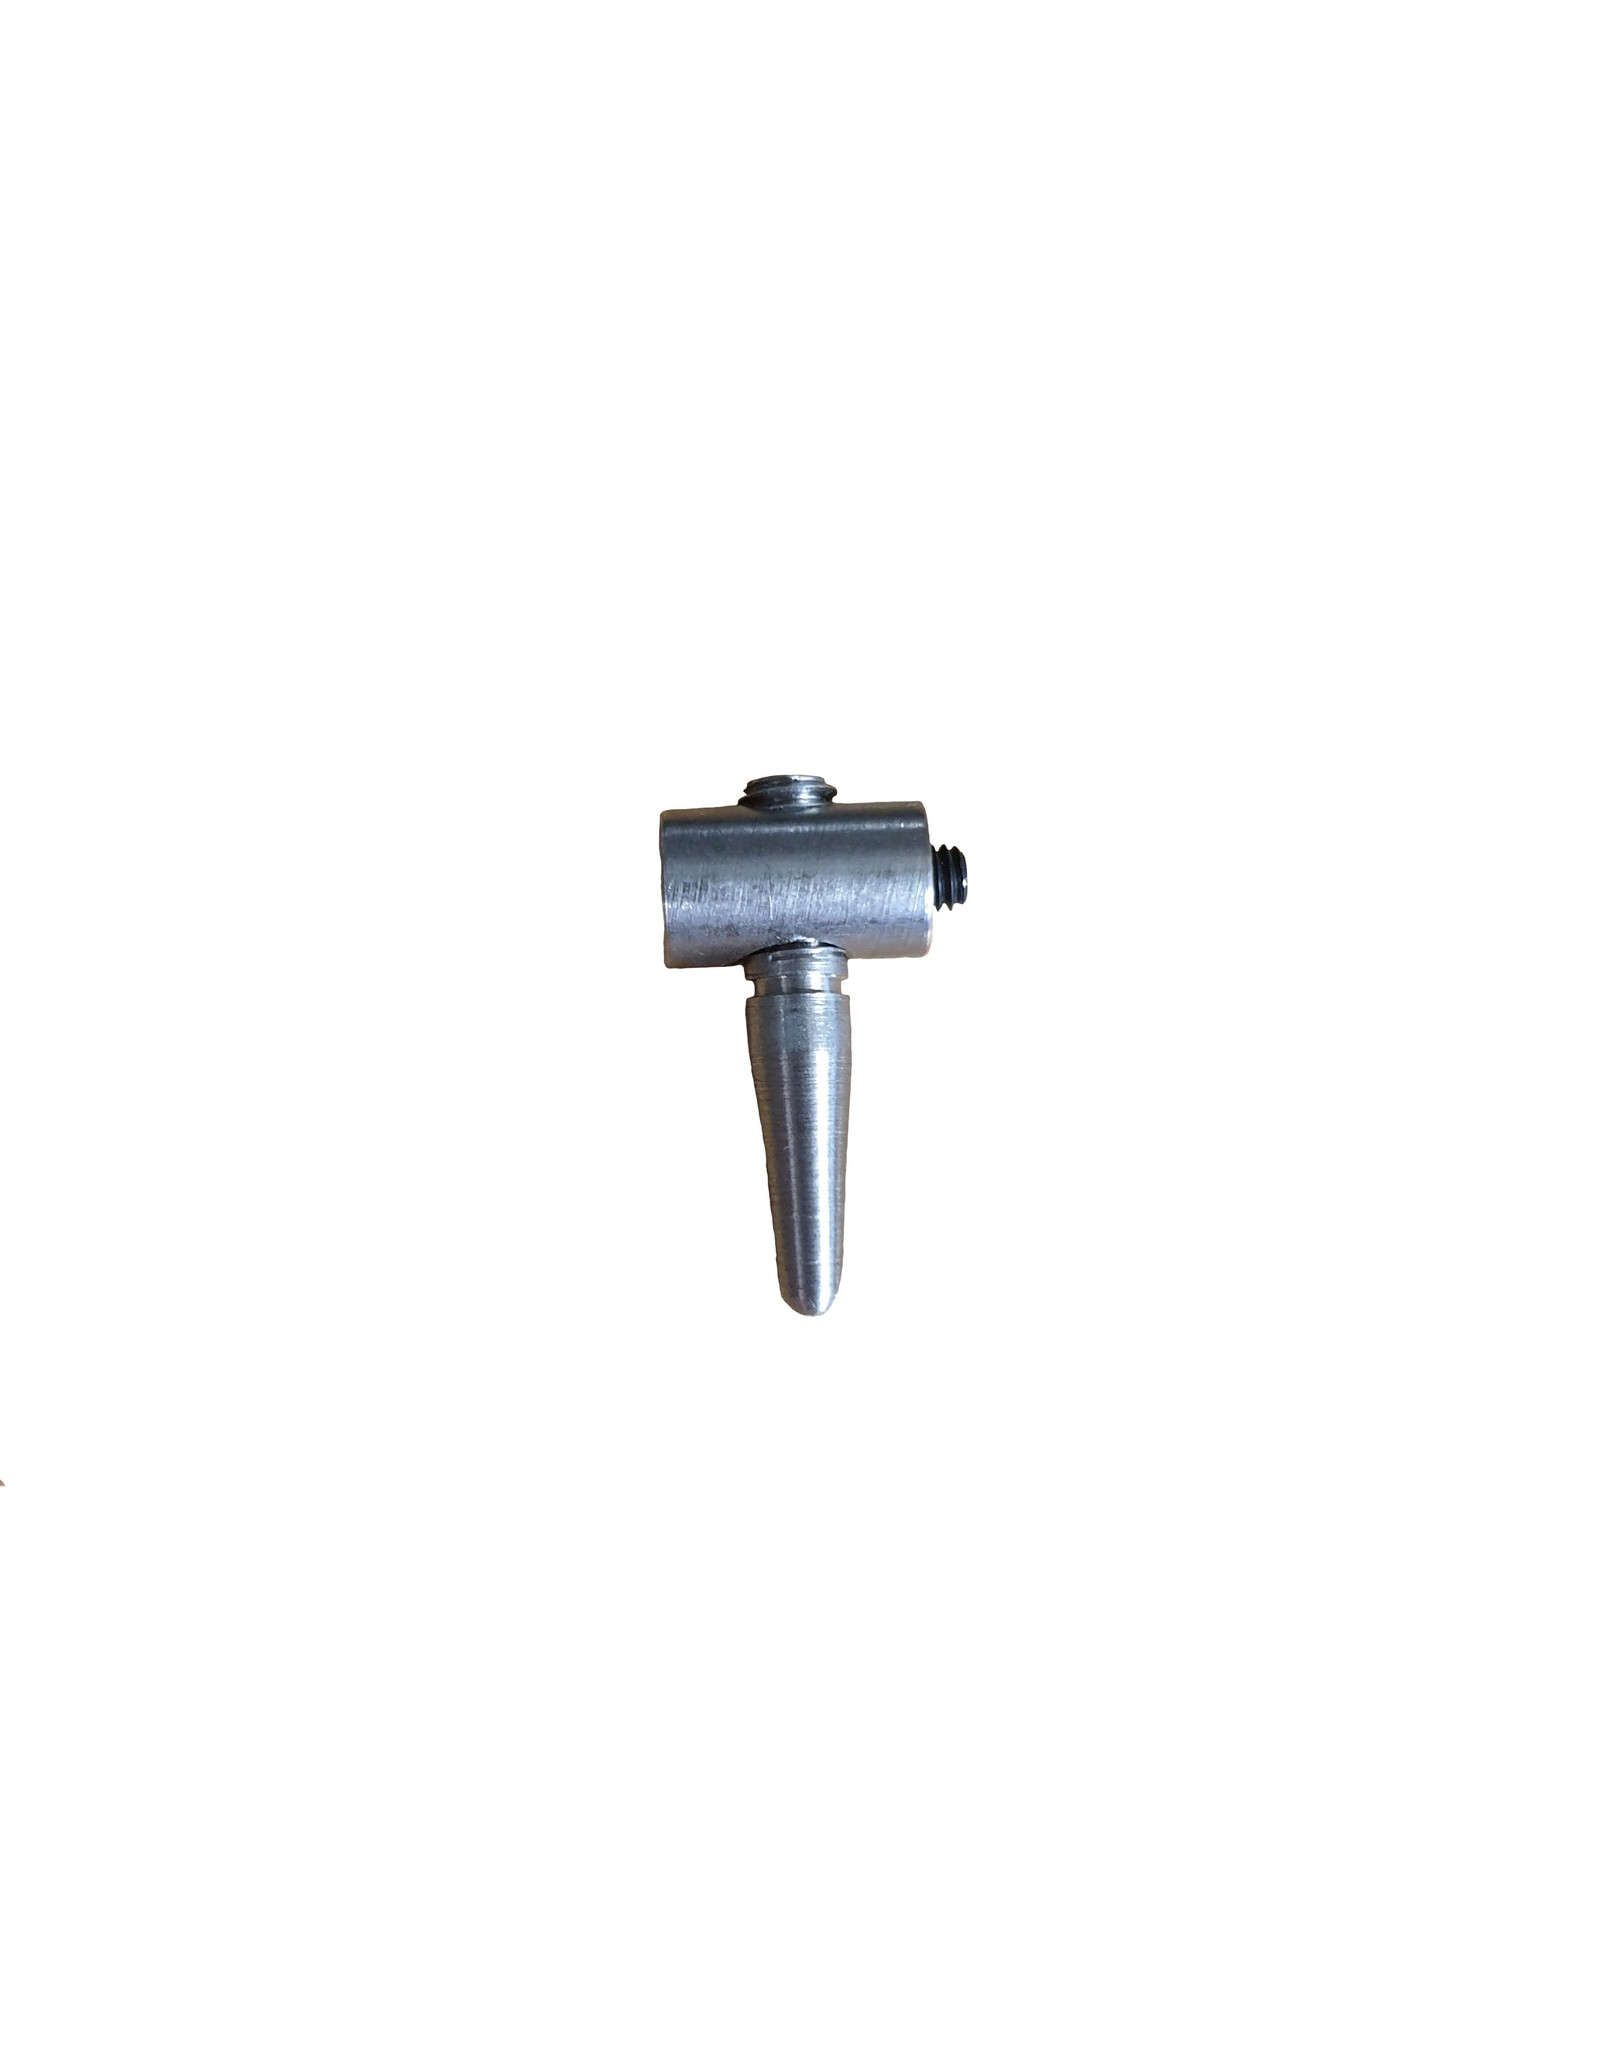 AP workshops Clutch Lever Push Rod (RSV 98-03/ Tuono 02-05)